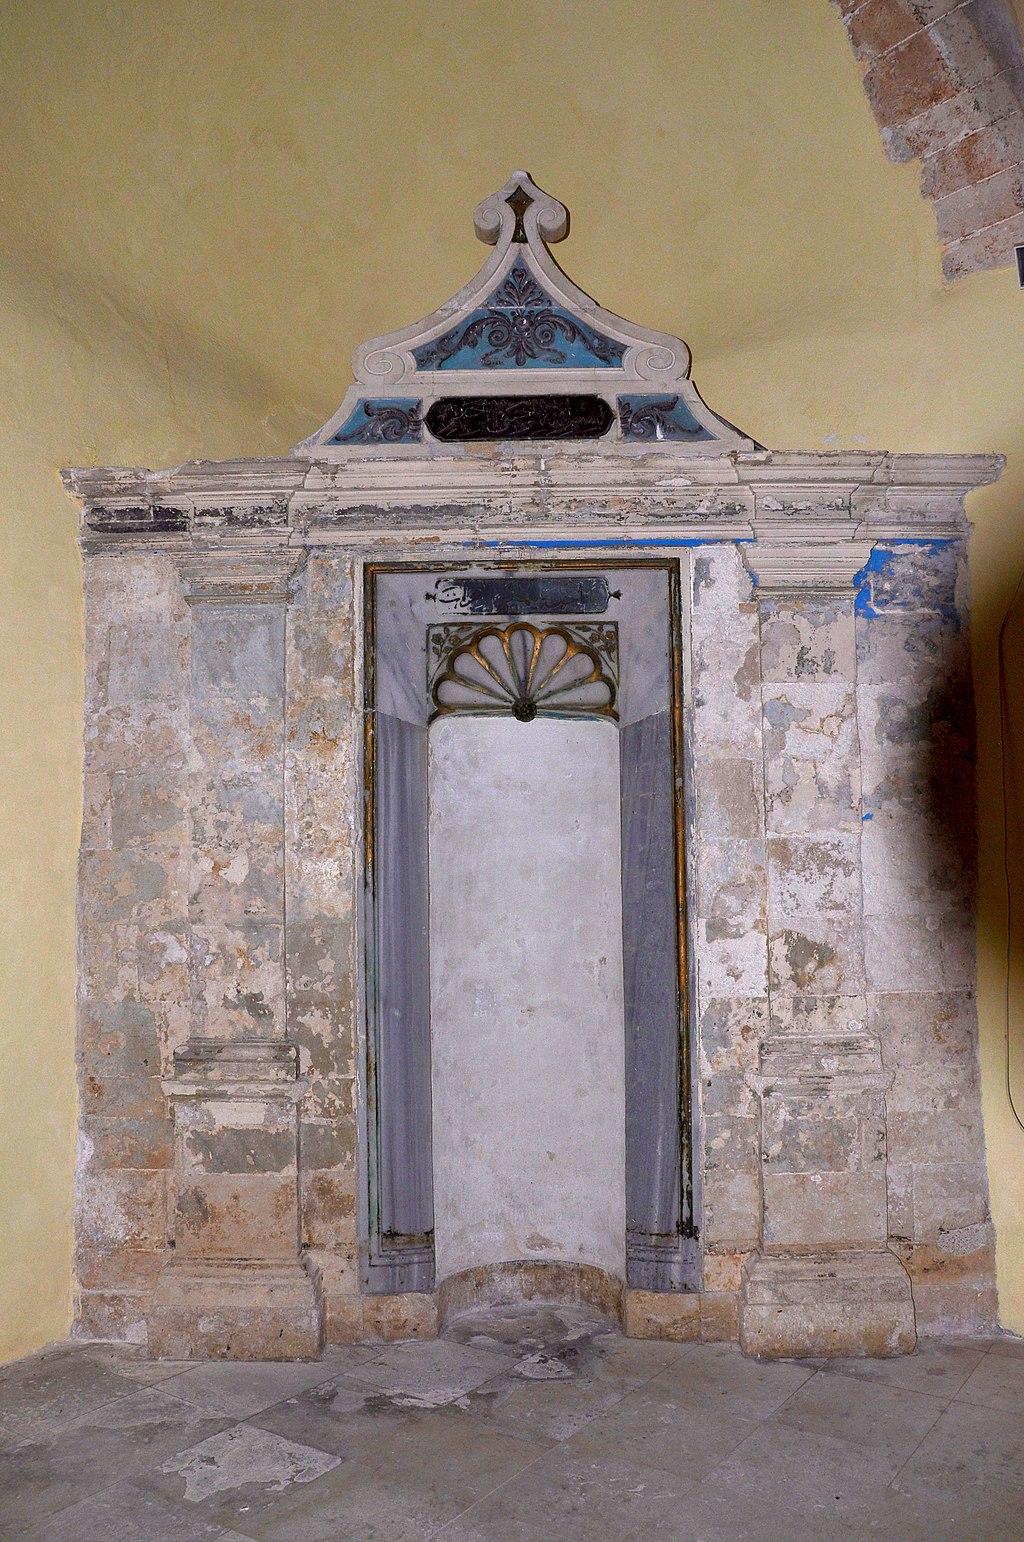 Küçük Hasan Pasha Mosque in Chania, Crete 004